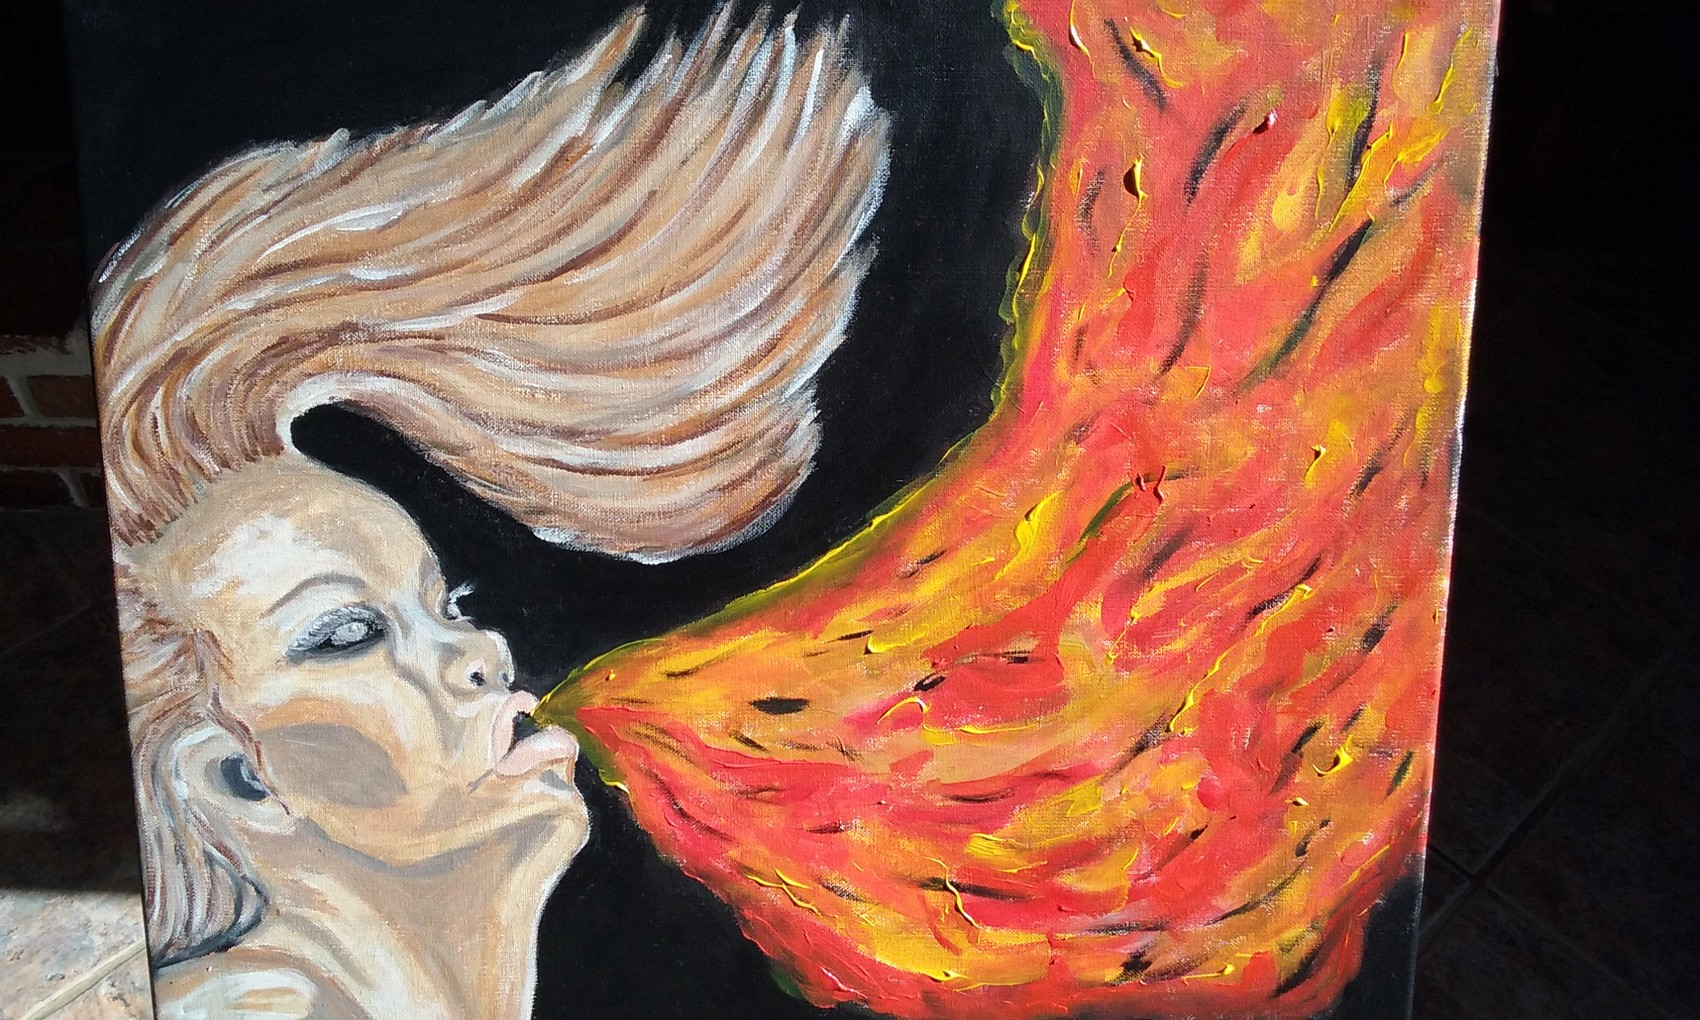 Cracheuse de feu